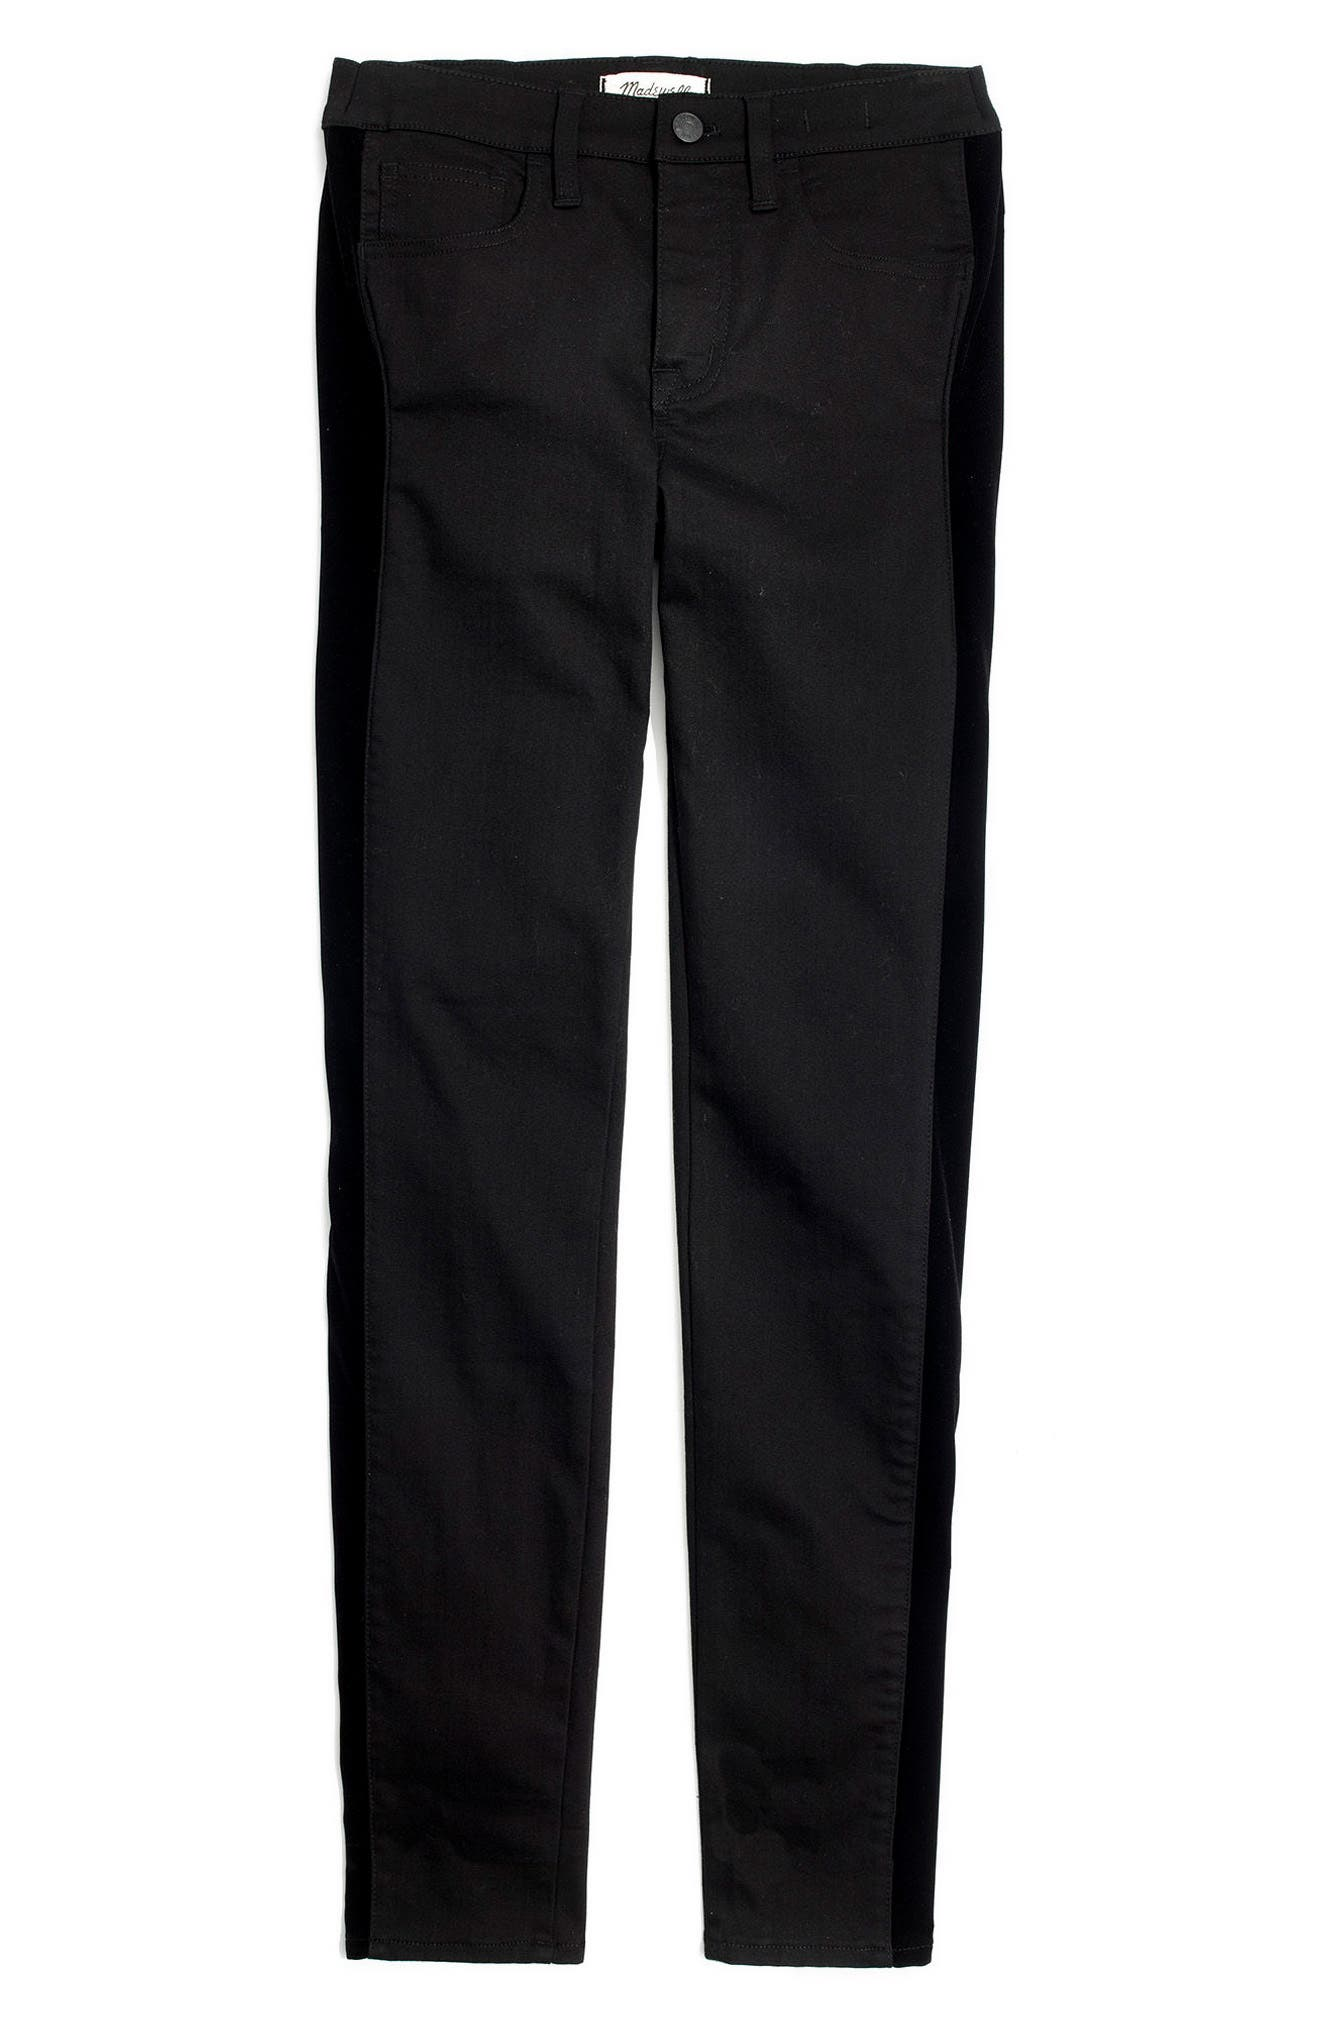 Alternate Image 4  - Madewell 9-Inch High Waist Tuxedo Stripe Skinny Jeans (Esther)